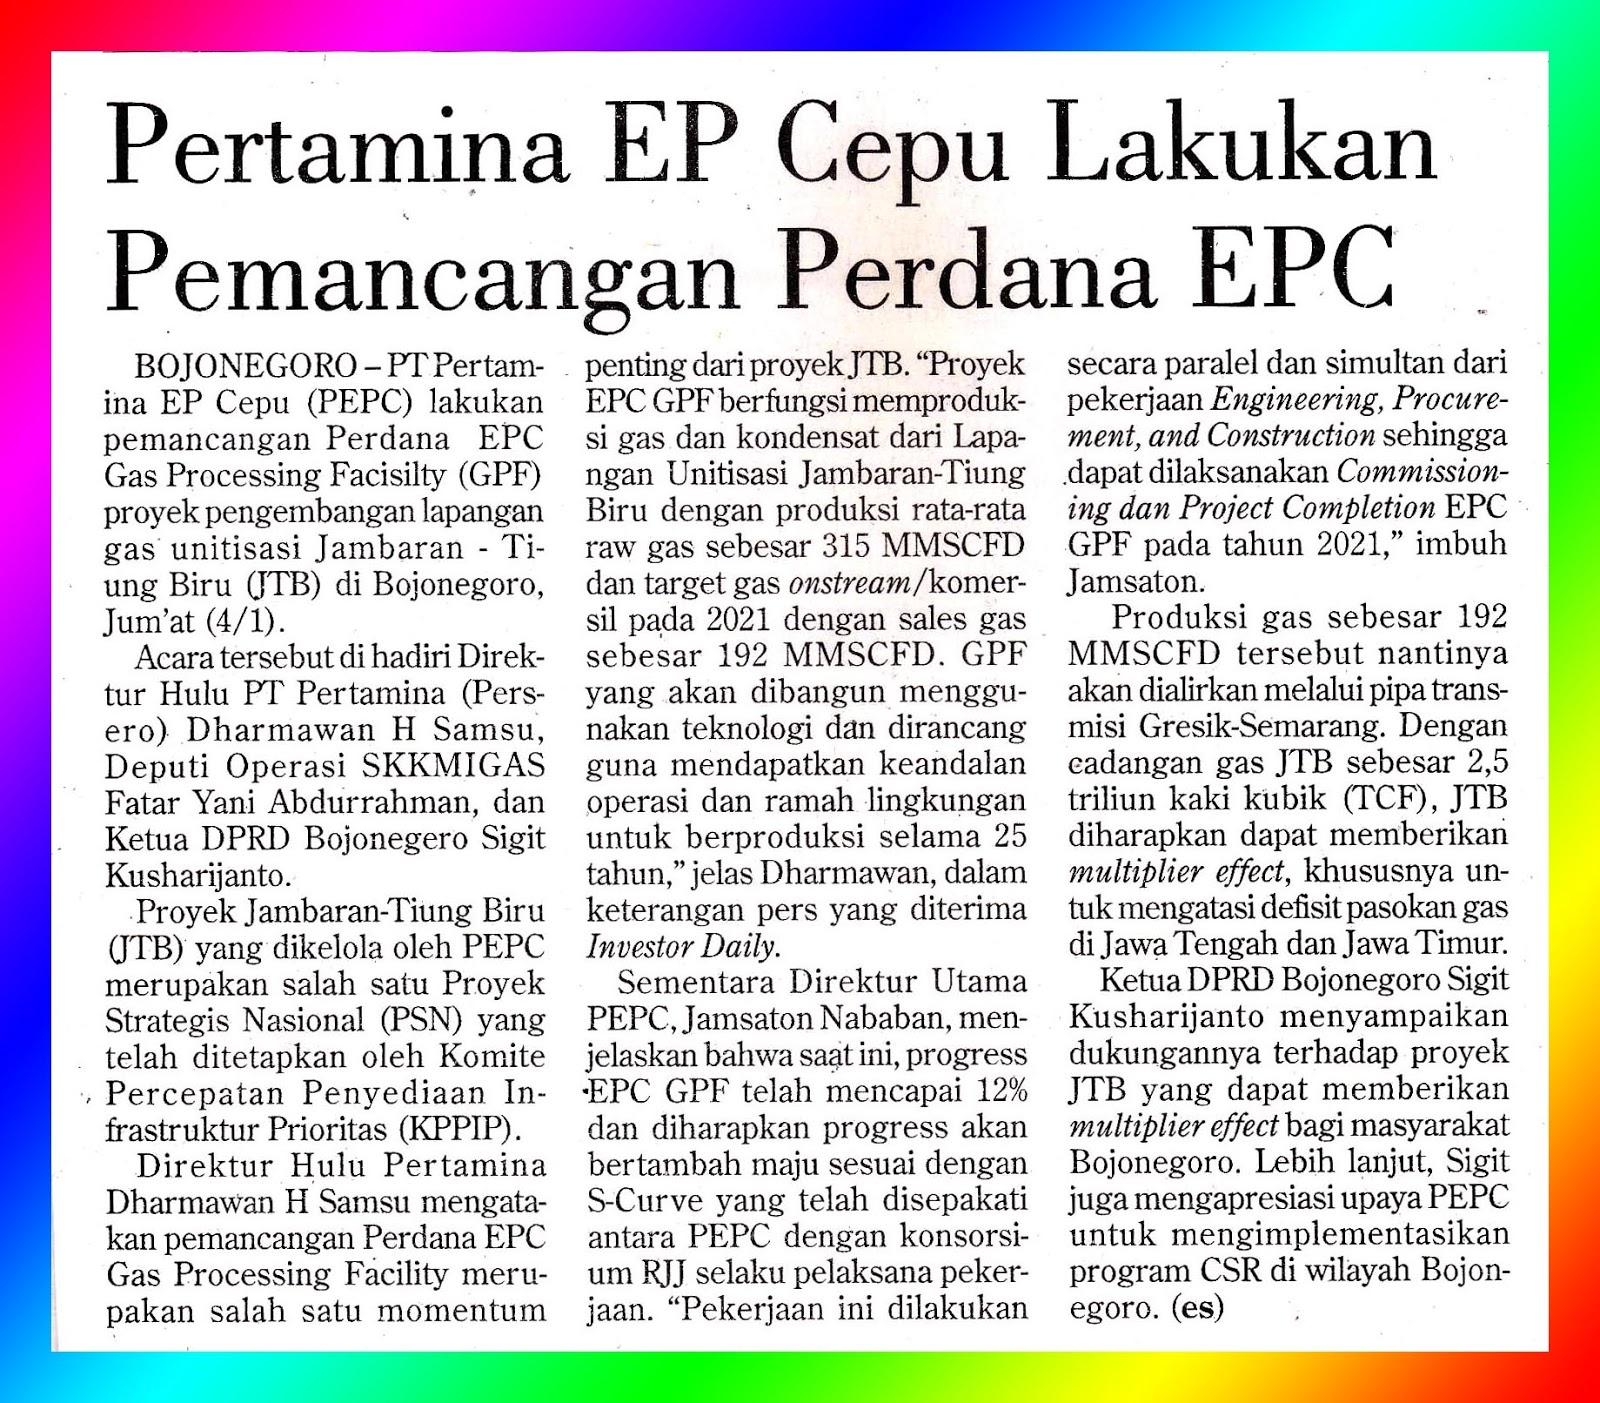 Pertamina EP Cepu Performs EPC I Prime Placement - MEDIA MONITORING